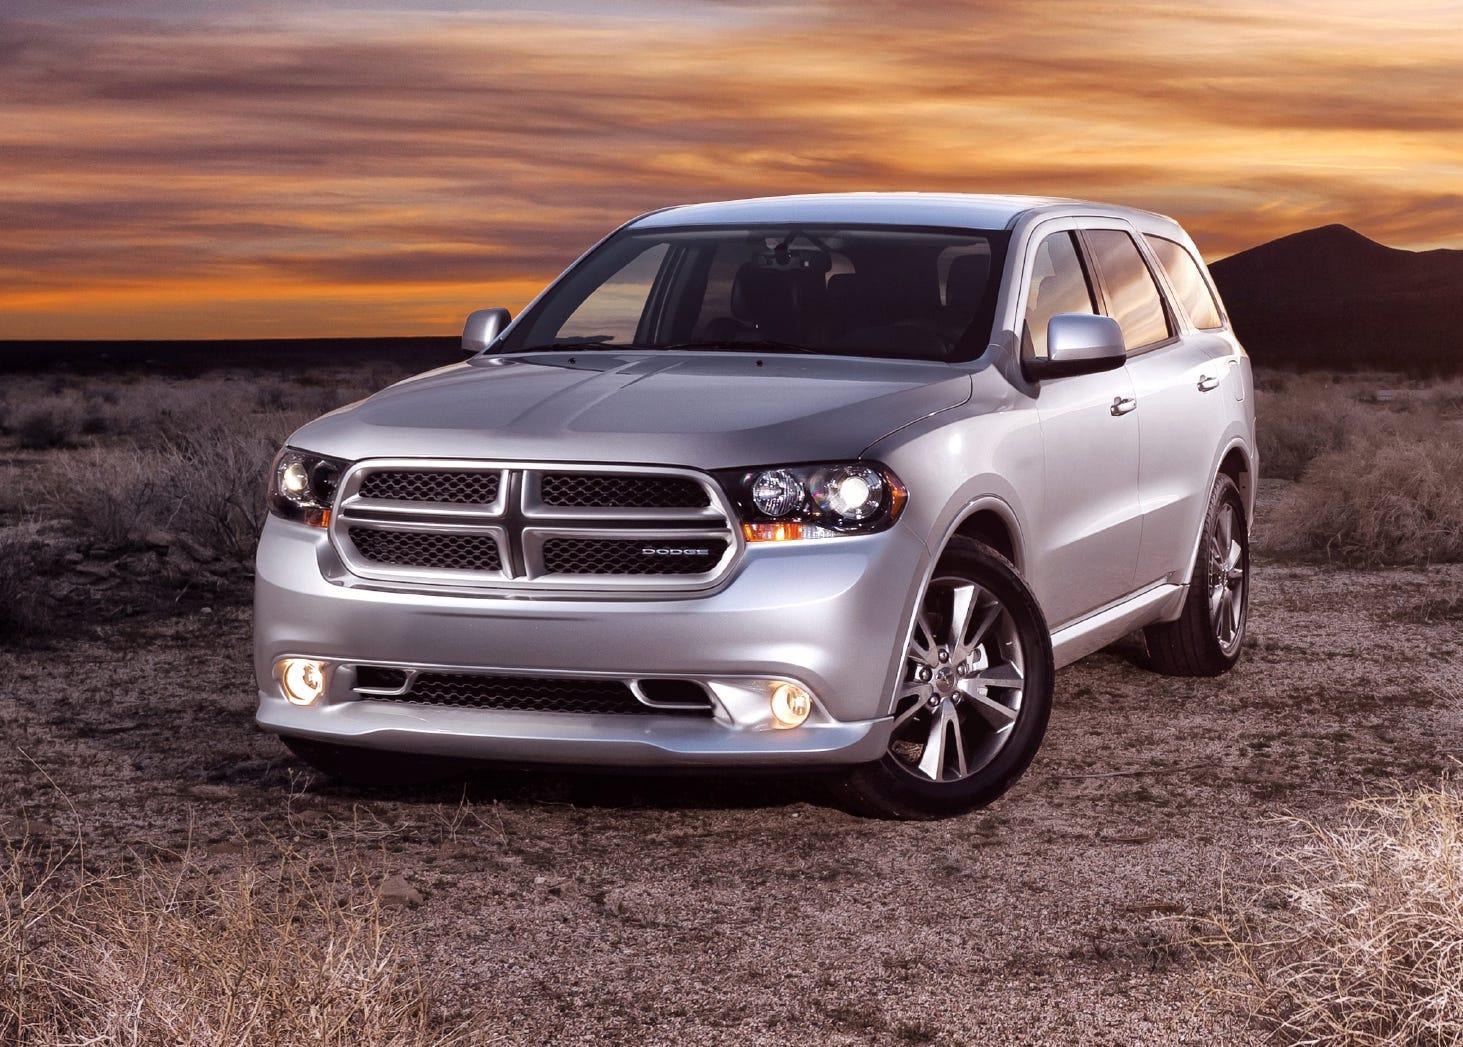 Fiat Chrysler Recalls Certain Dodge Jeep Suvs Over Potential Stalling